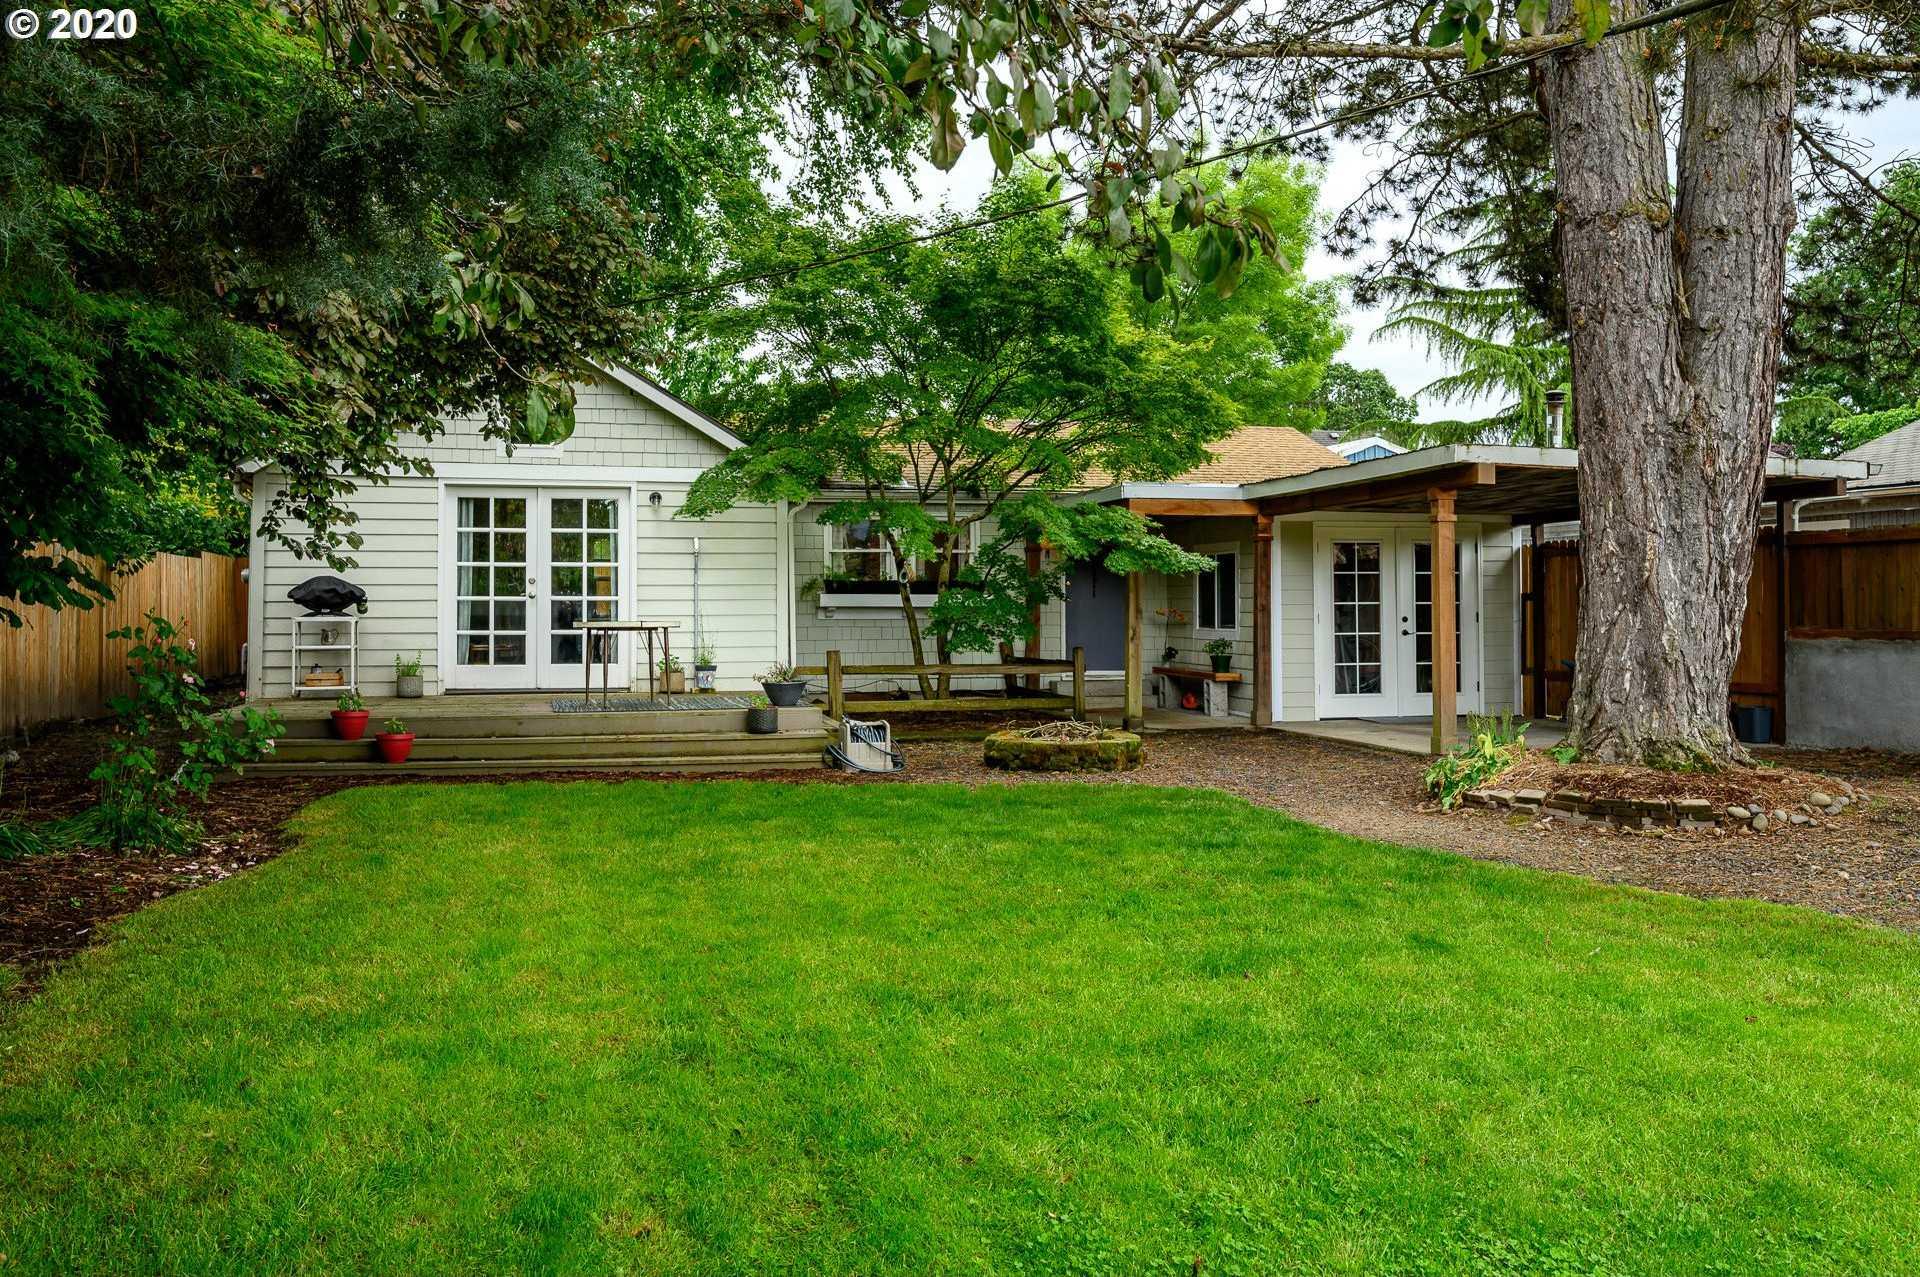 $319,000 - 2Br/1Ba - for Sale in Newberg